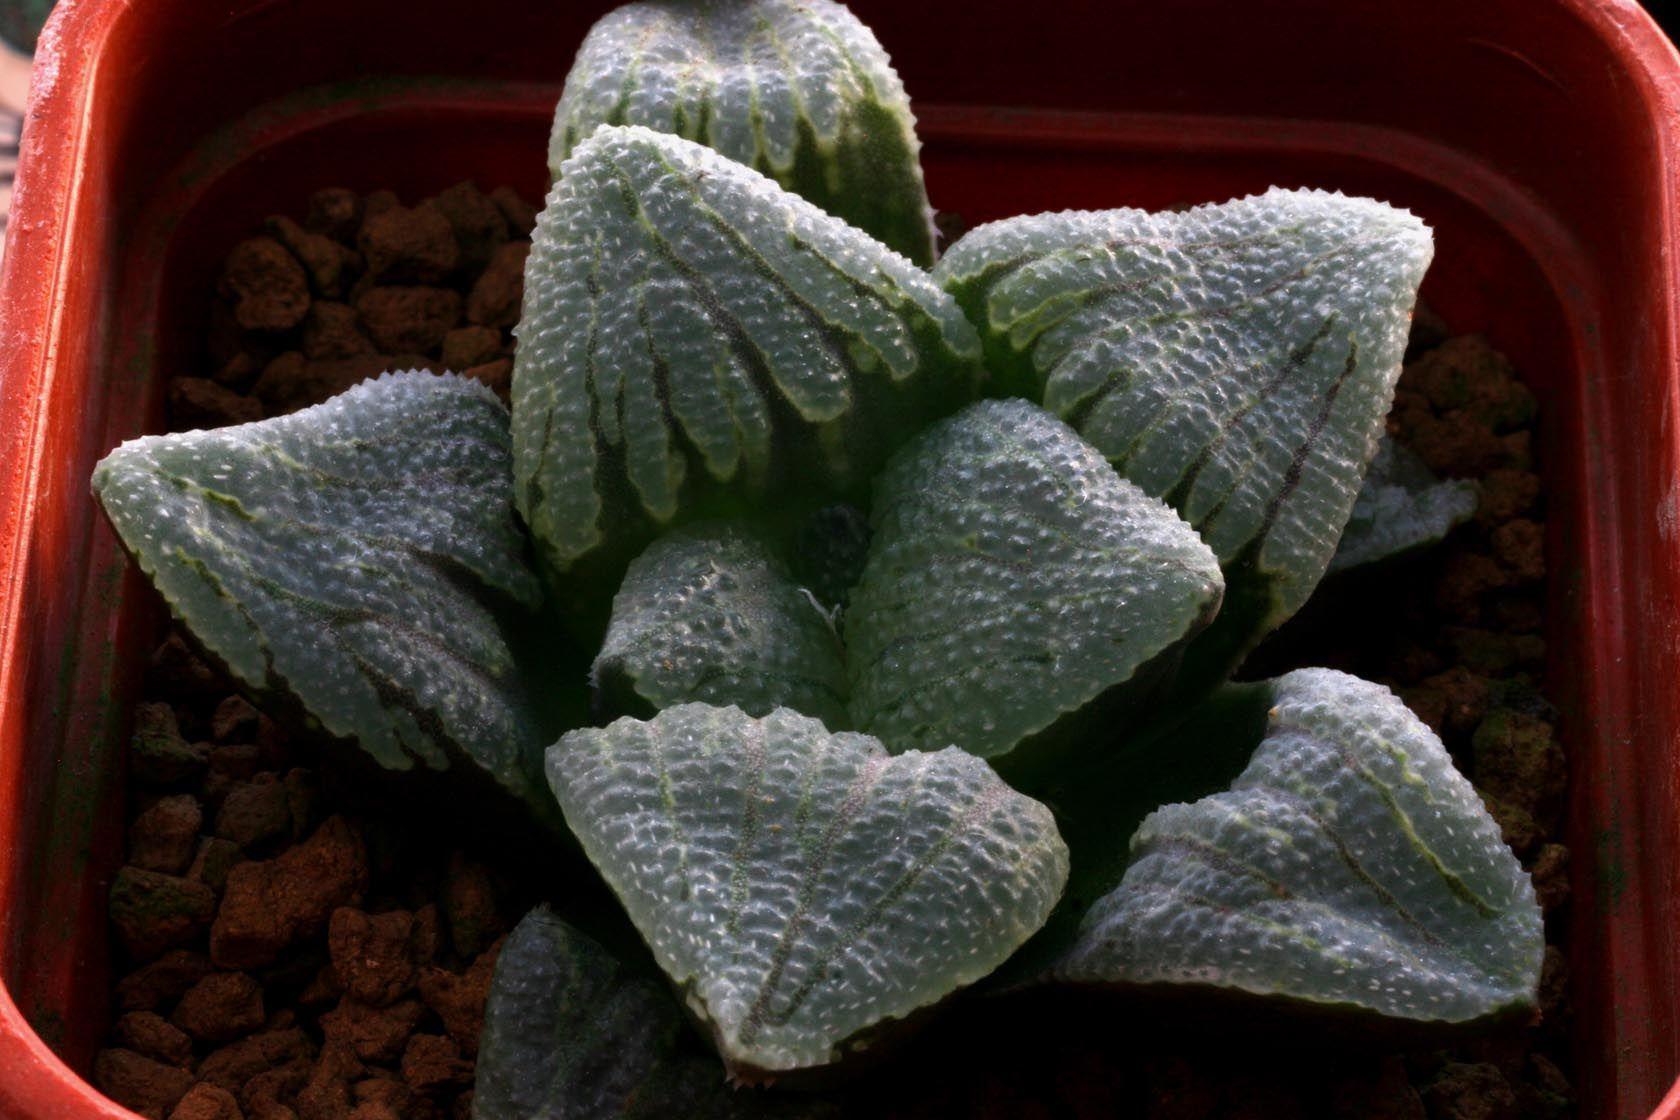 Haworthia pygmaea YO1106 [Moerasriver, S.Oudtshoorn] ex STC